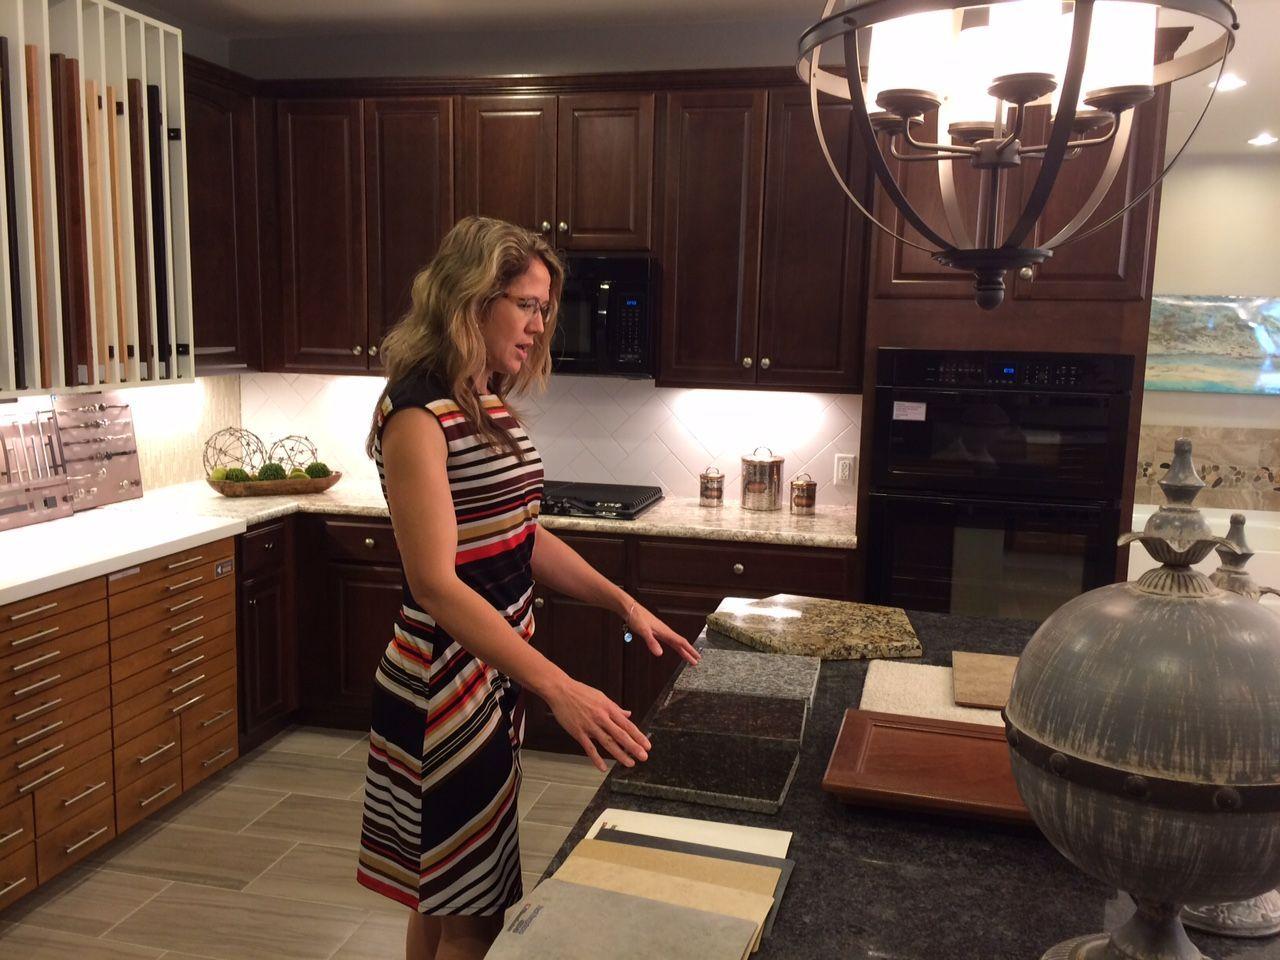 56df64b96b690imageresize12002c900 design studio helps kb home buyers decorate - Kb Homes Design Studio